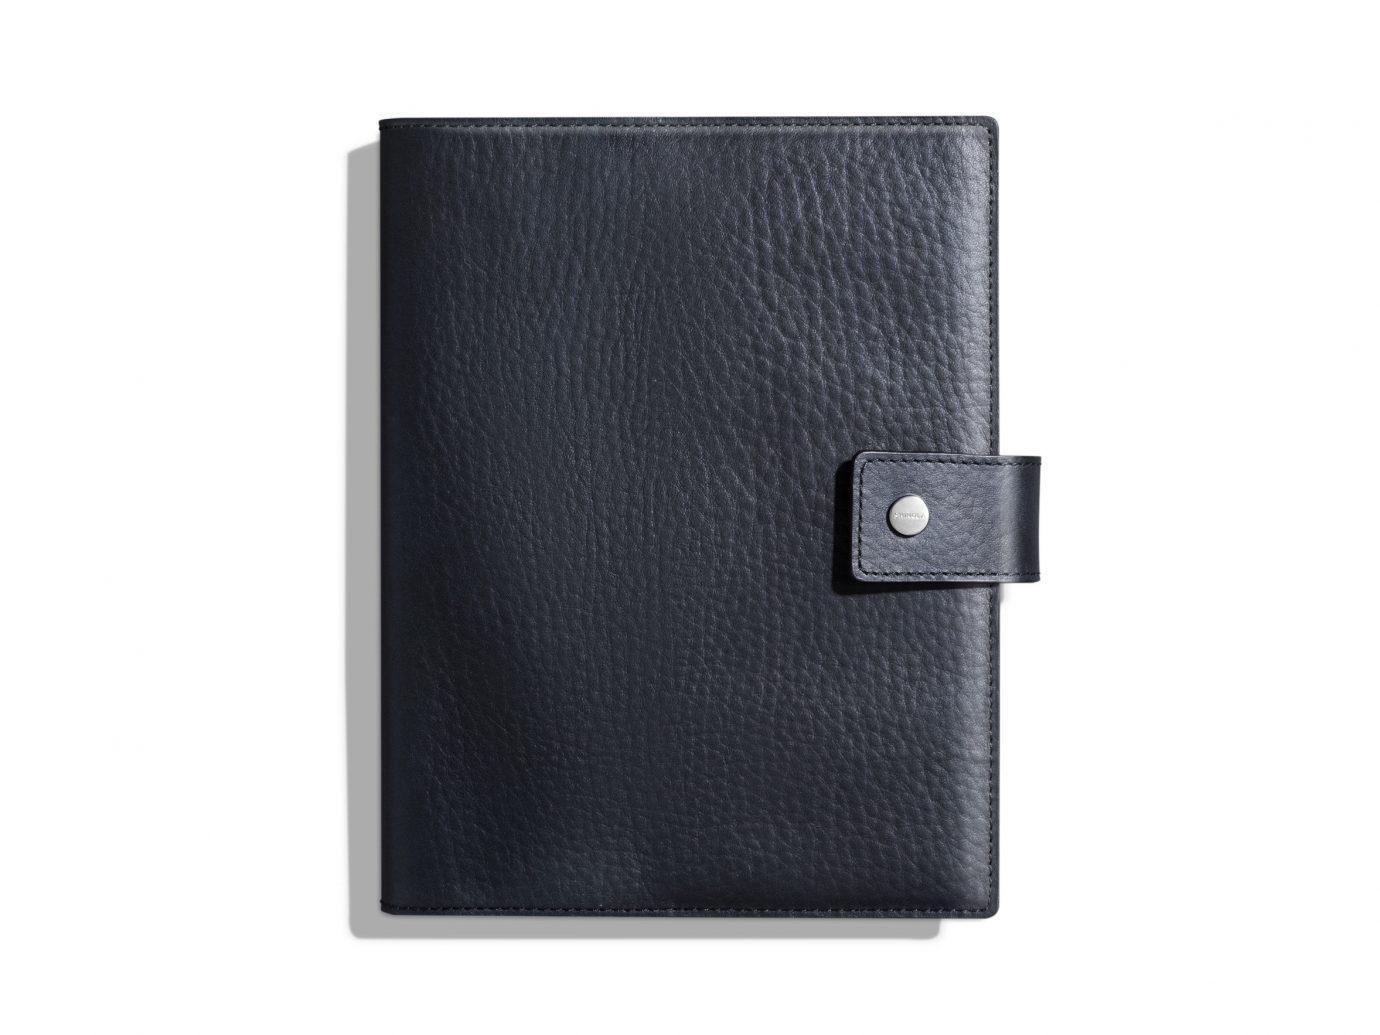 Arts + Culture Boutique Hotels City Jetsetter Guides black case accessory wallet product product design